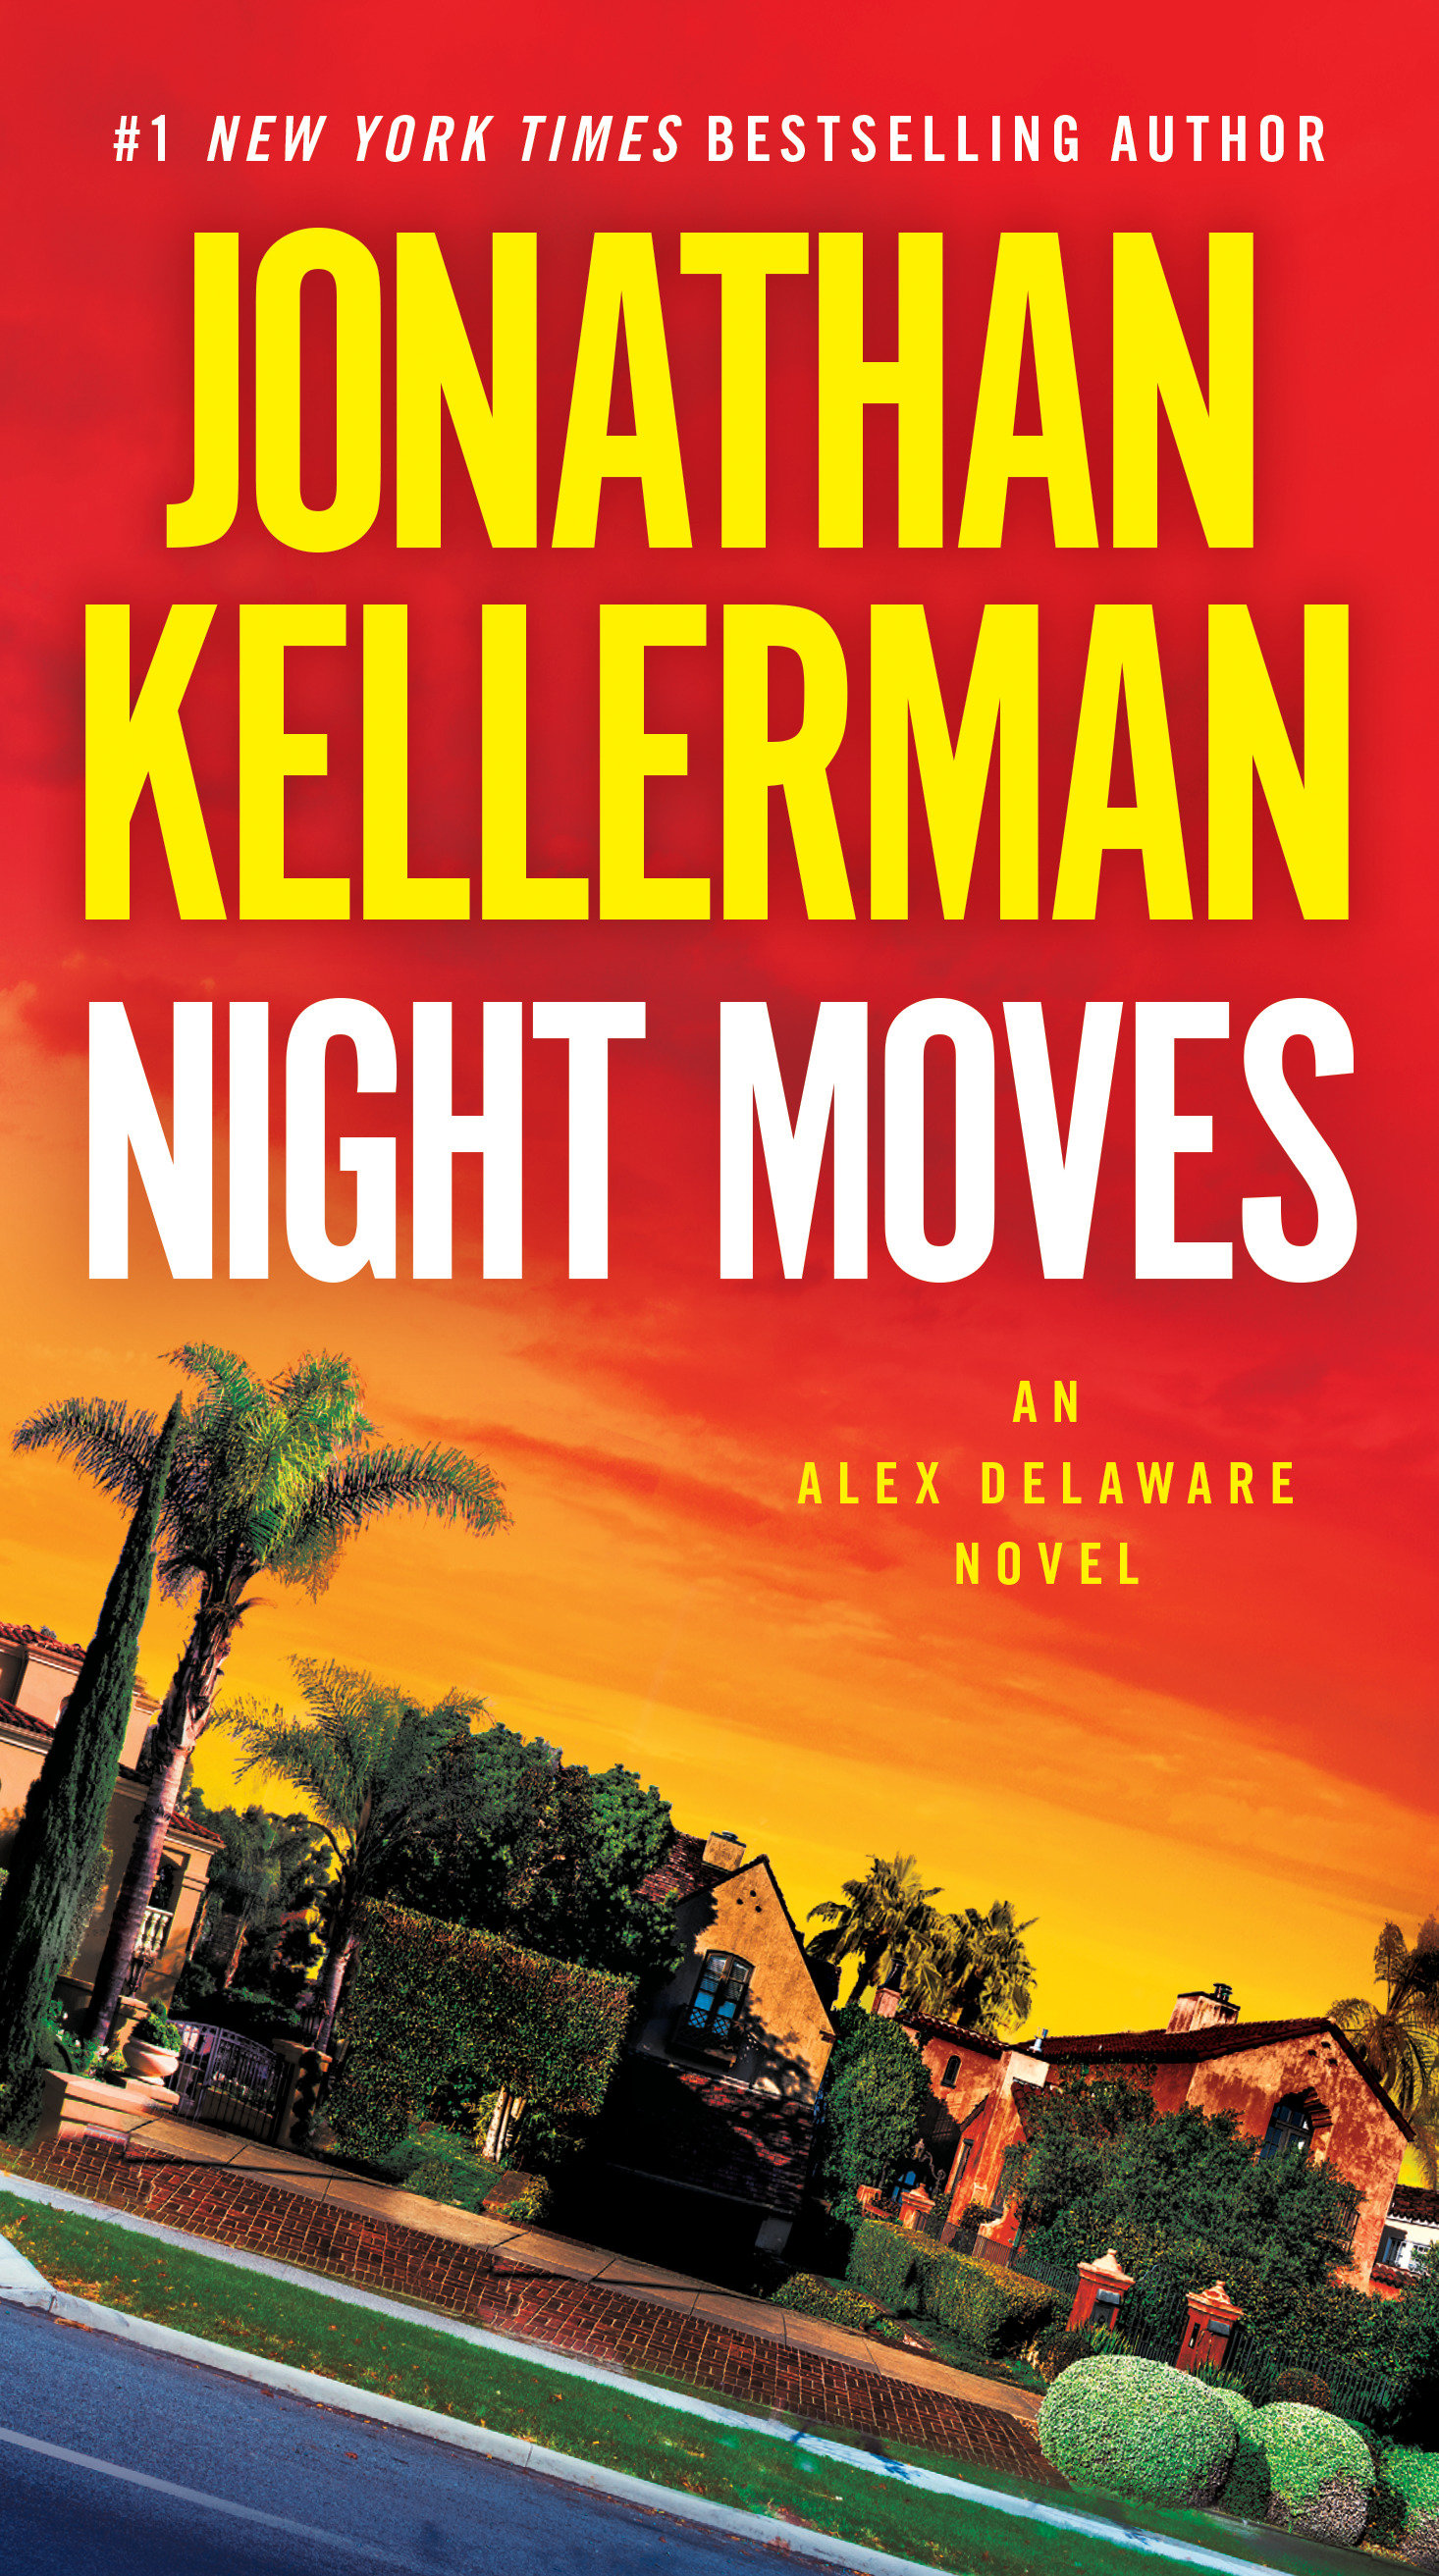 Night Moves An Alex Delaware Novel